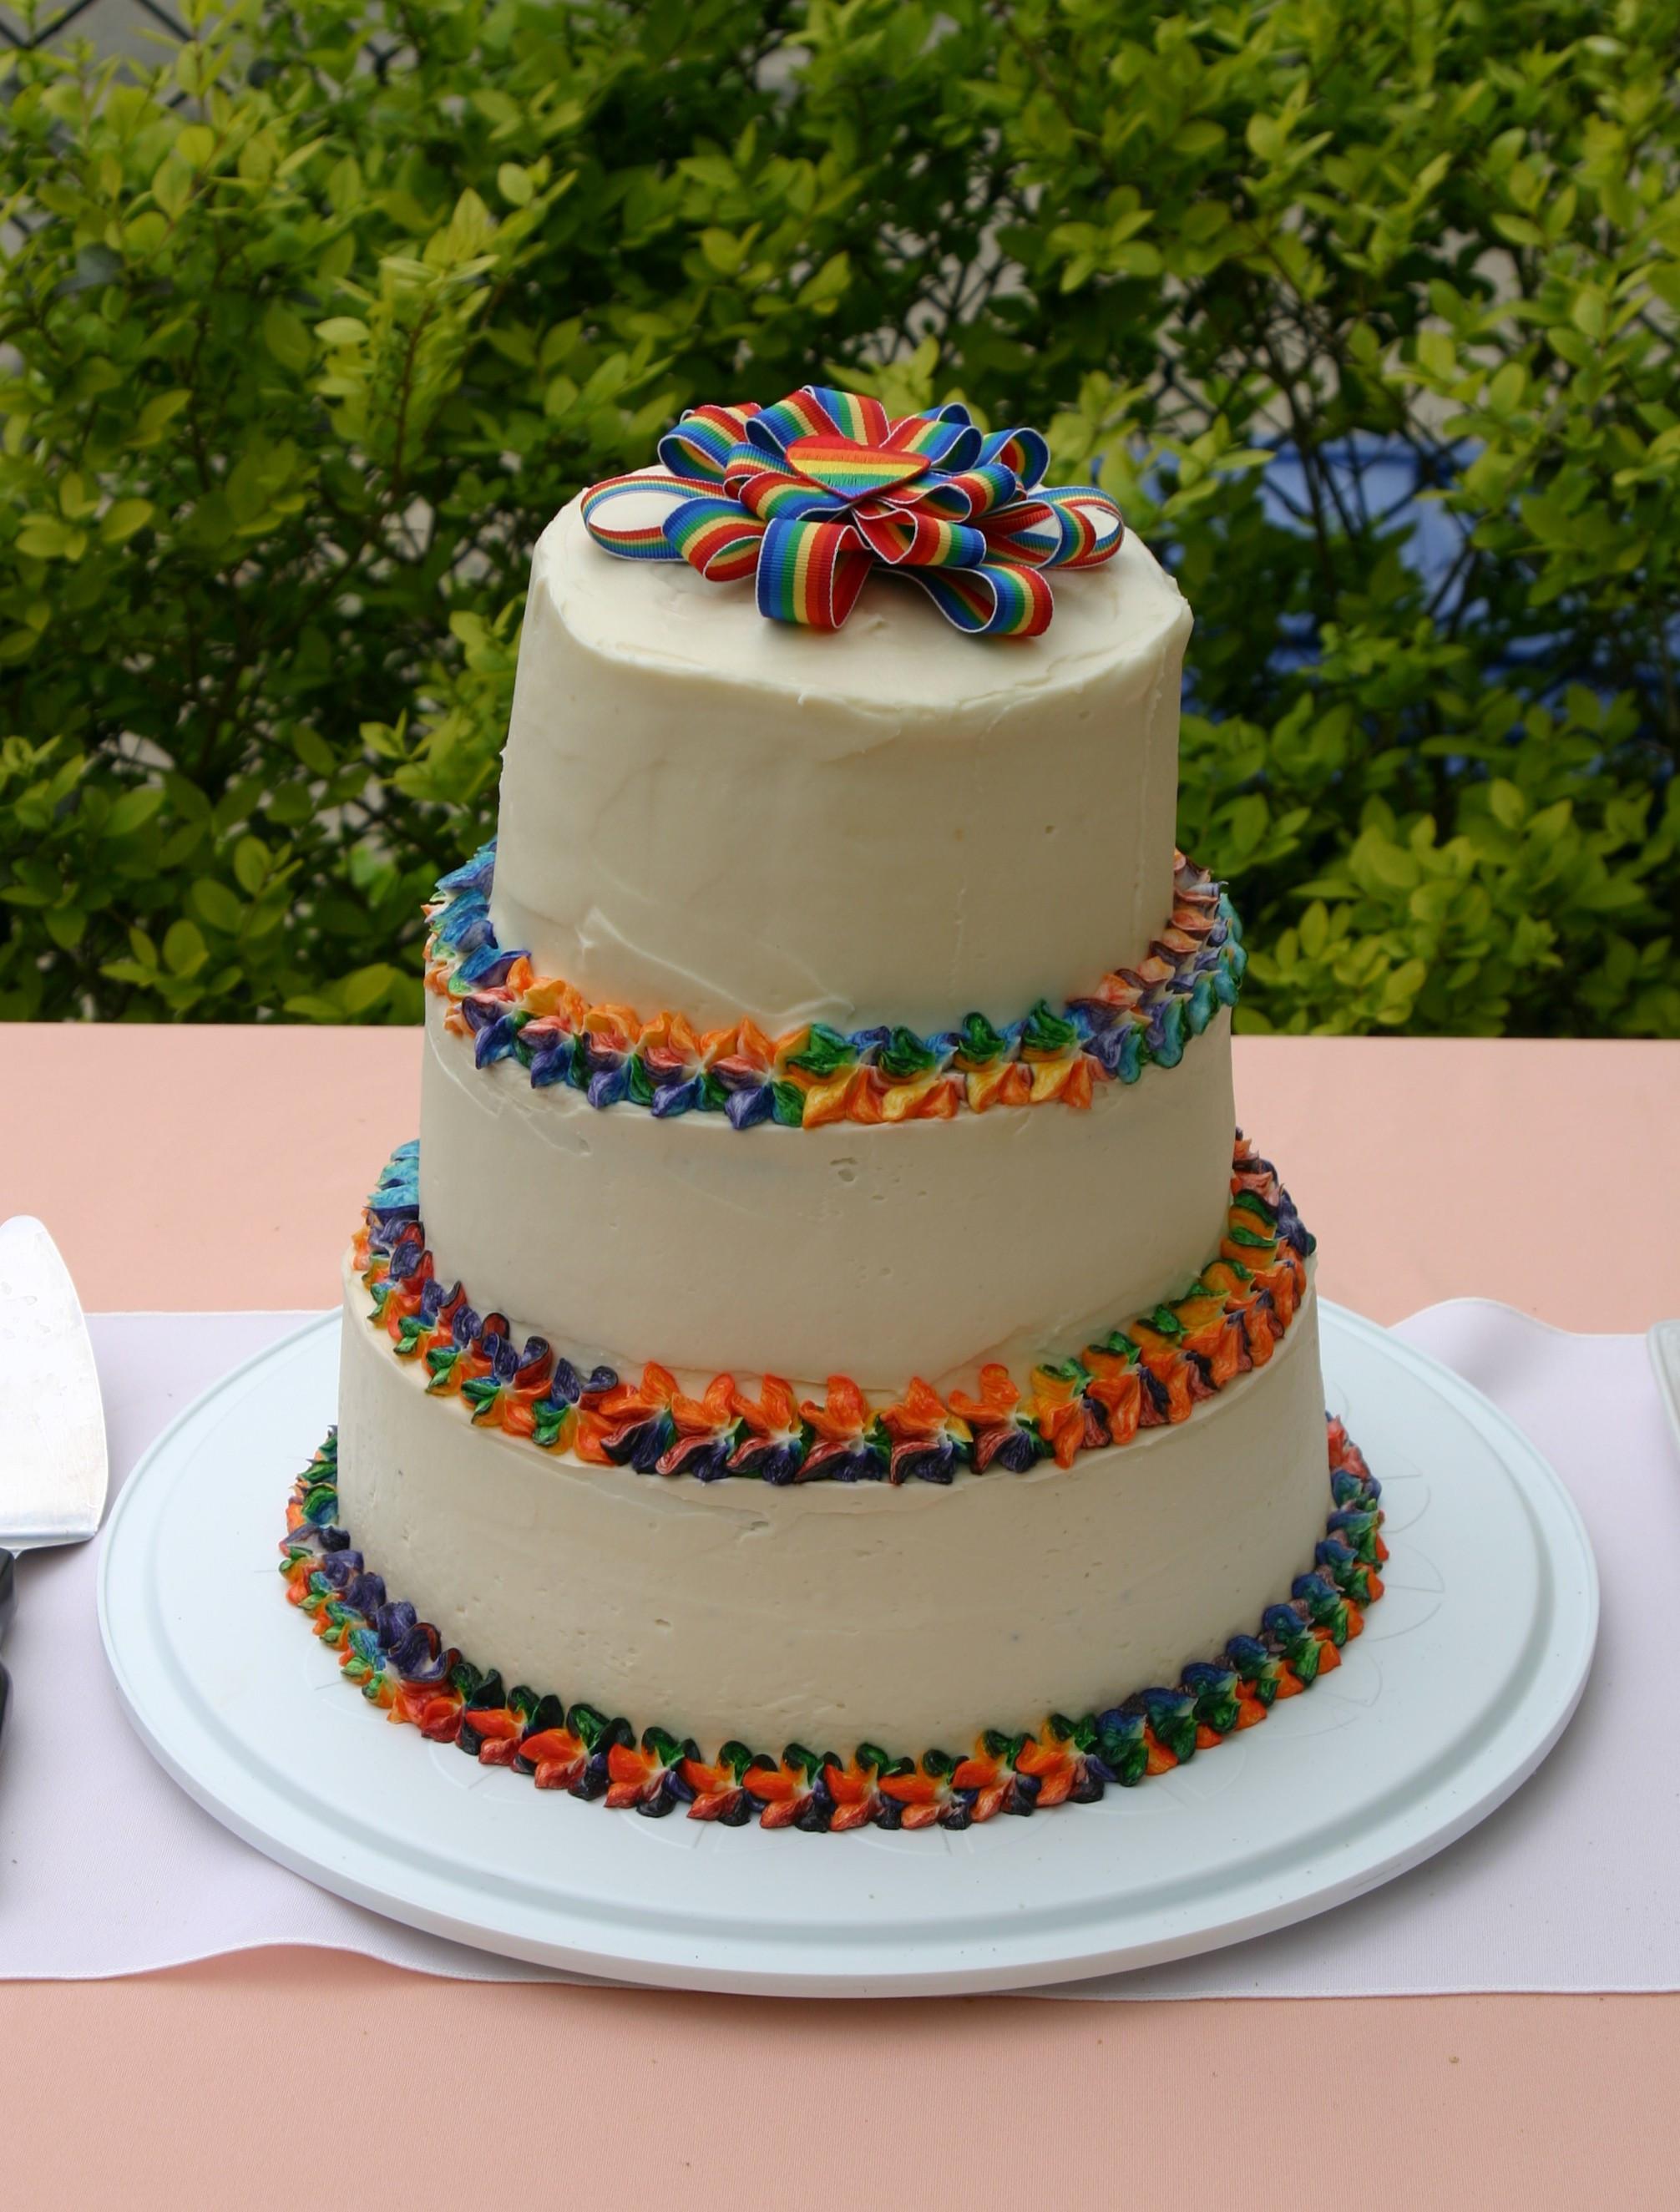 Rainbow Wedding Cakes  My First Wedding Cake